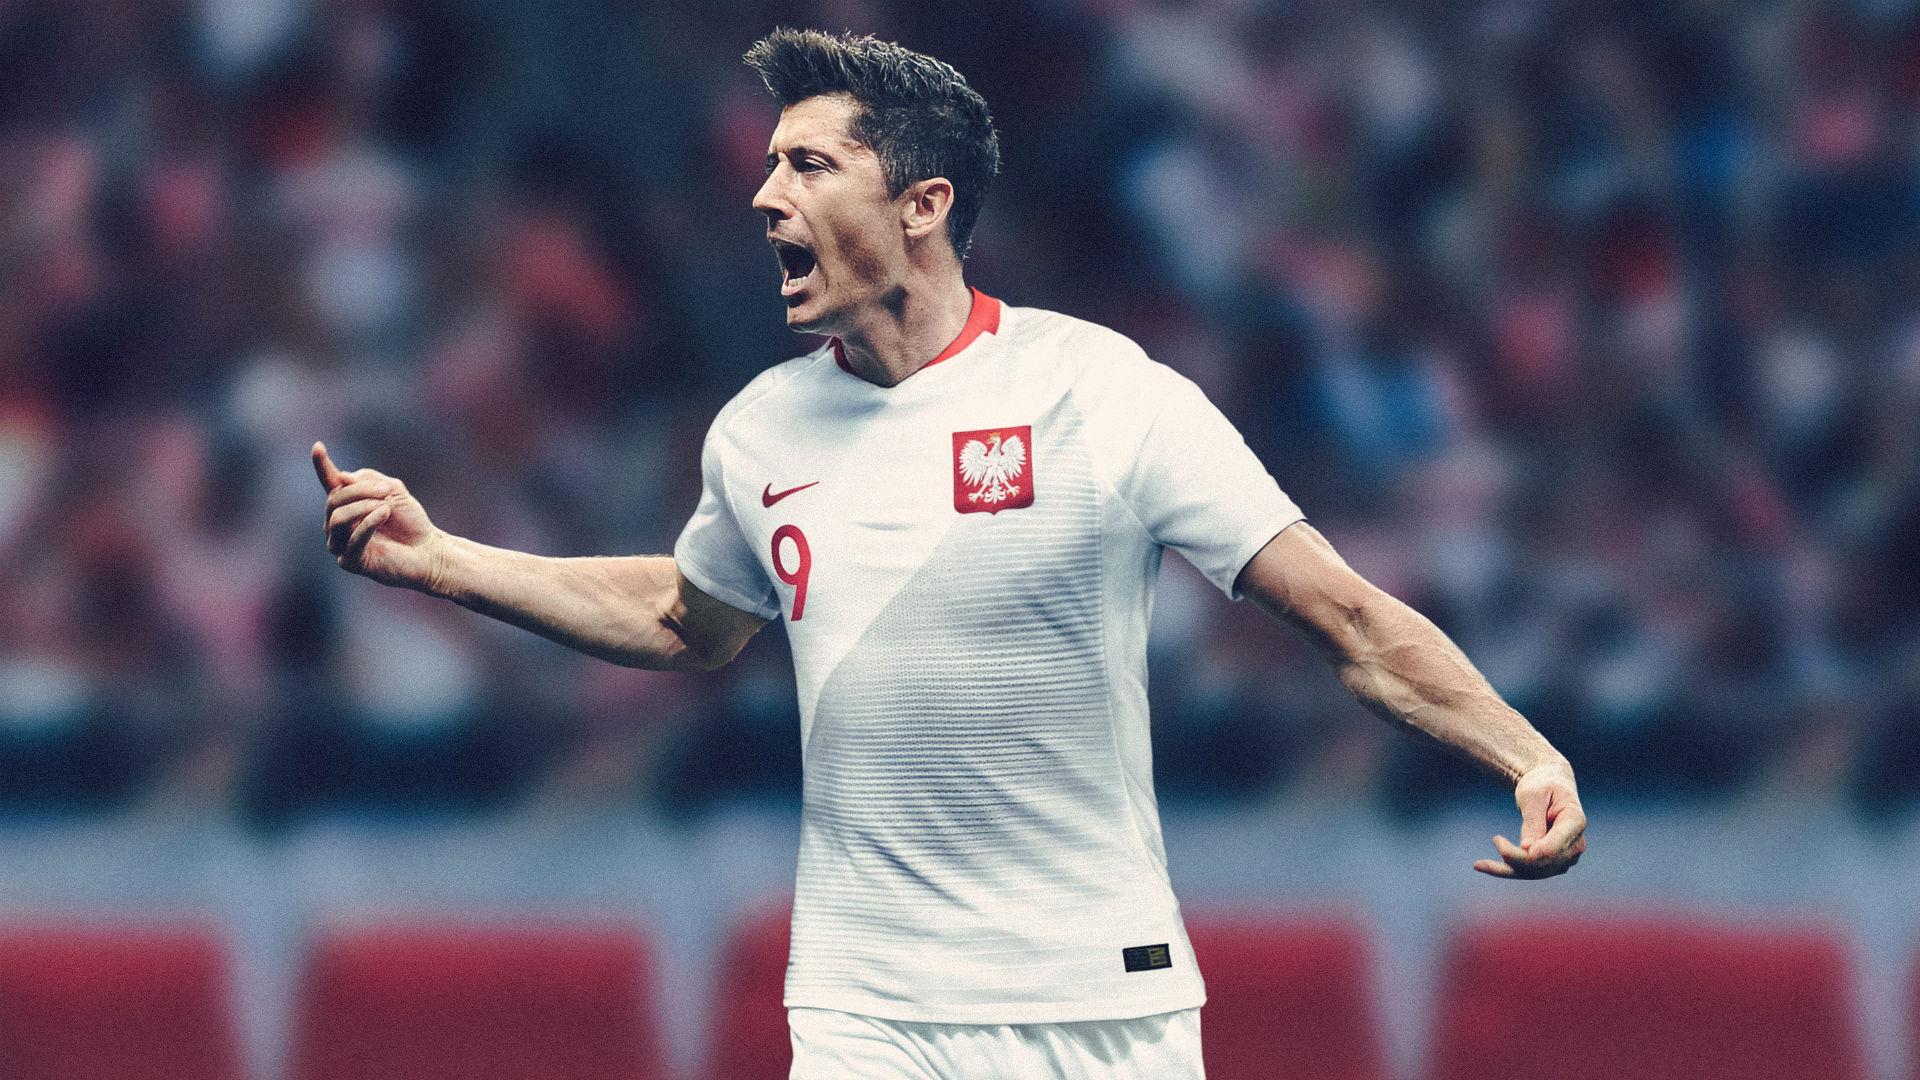 Wonderful England Football World Cup 2018 - robert-lewandowski-poland-world-cup-2018-home-kit_1ls6eb2truoey1q5txd09i2rq4  Pictures_714187 .jpg?t\u003d1296384442